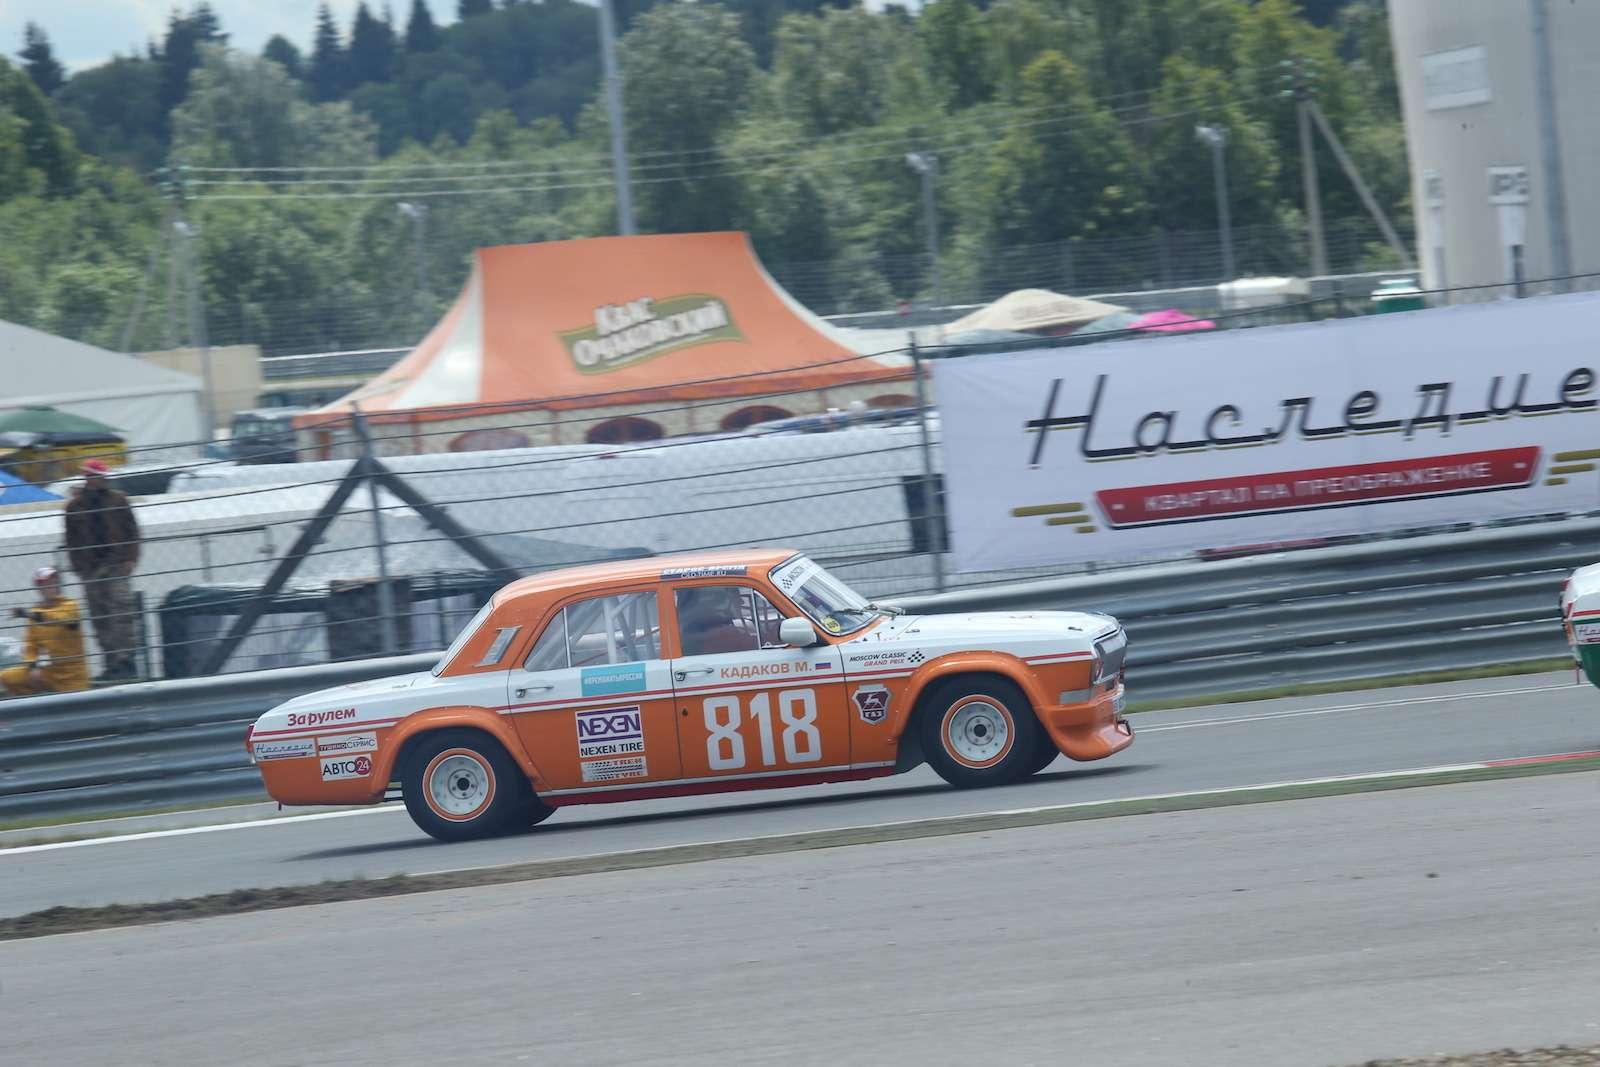 Болид ГАЗ-24«Зарулем» наMoscow Classiс Grand Prix— фото 608349